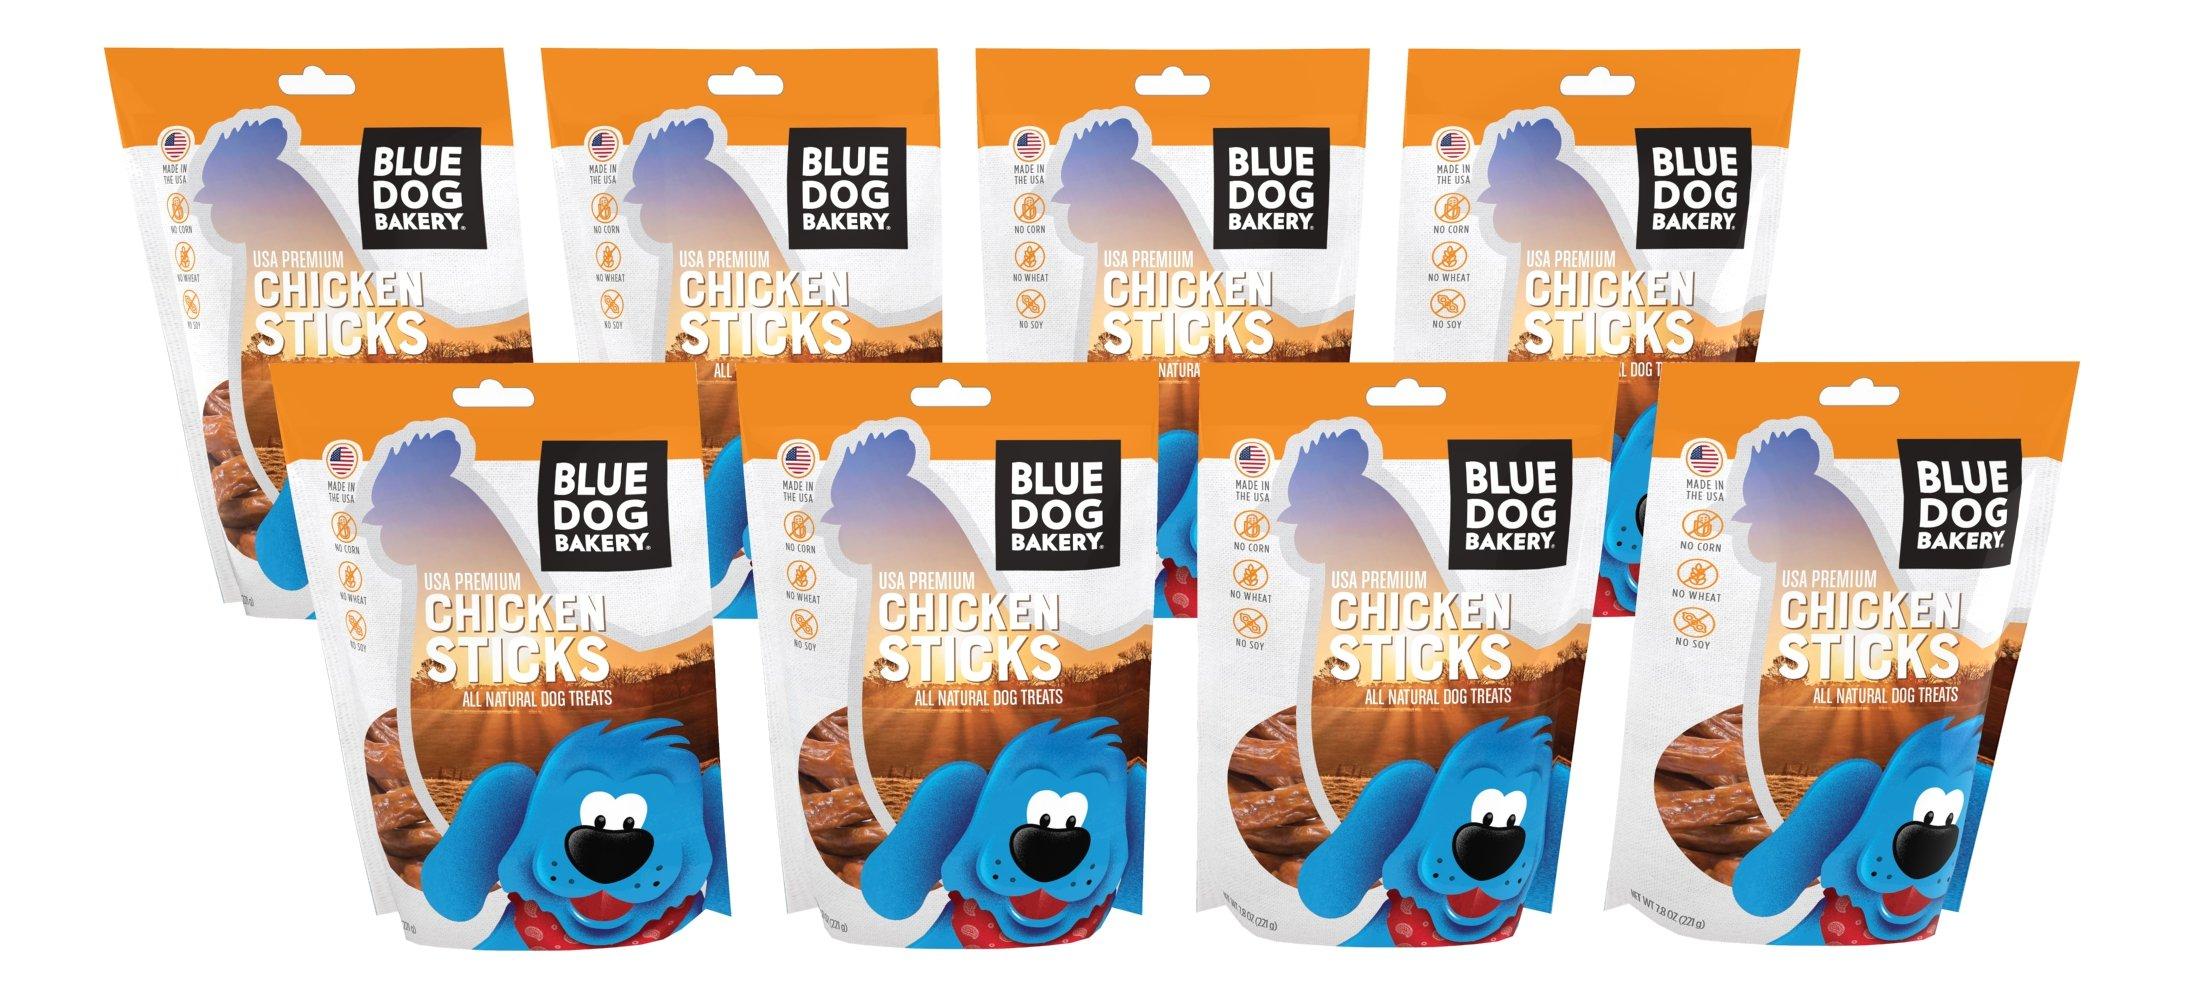 Blue Dog Bakery Natural Dog Treats, Grain Free, Chicken Sticks by Blue Dog Bakery